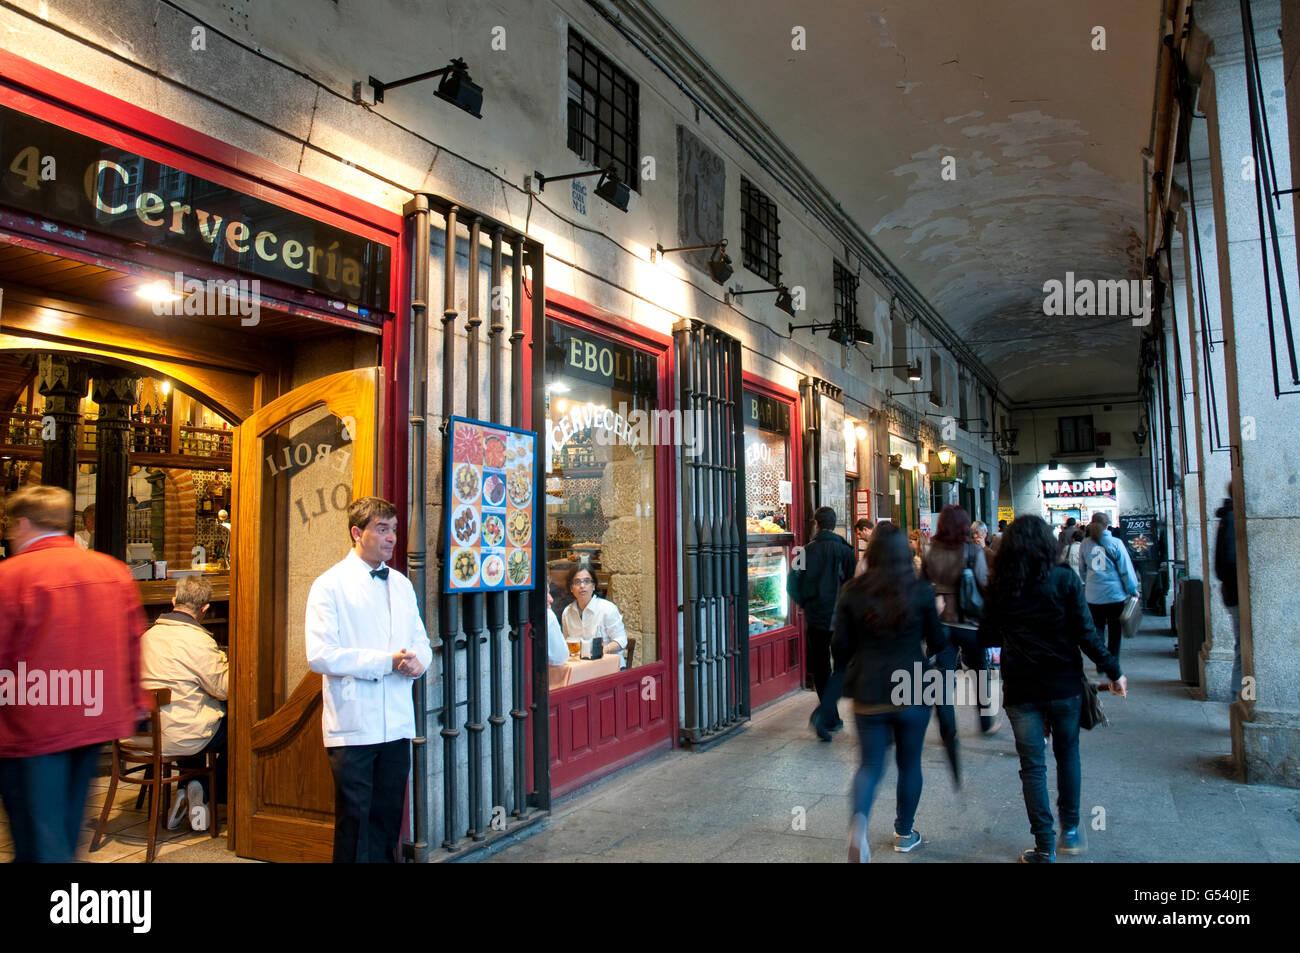 Arcade and restaurant. Main Square, Madrid, Spain. - Stock Image